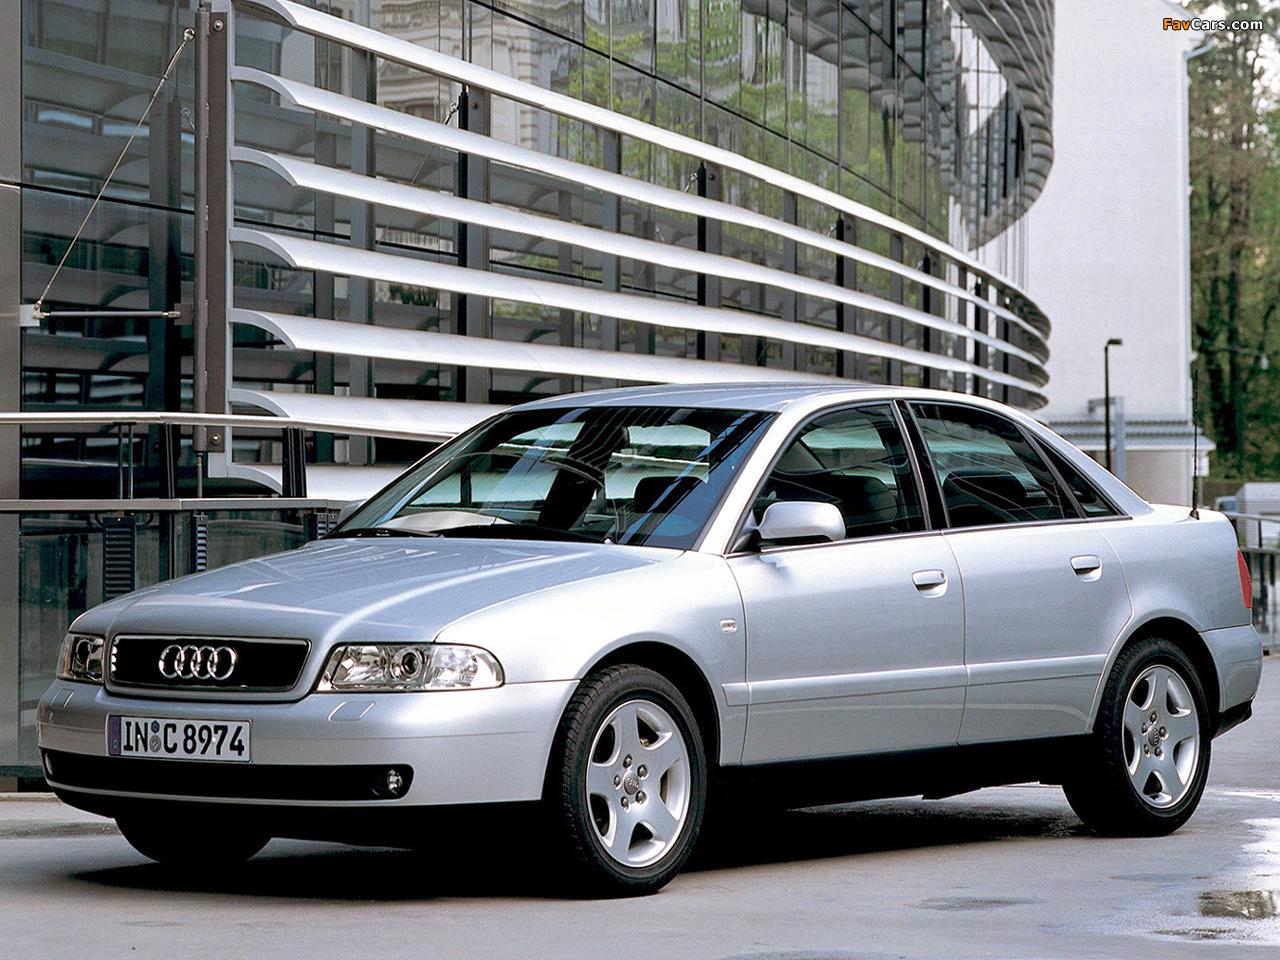 Audi a4 1 8 tdi sedan b5 8d 1997 2000 photos 1280 x 960